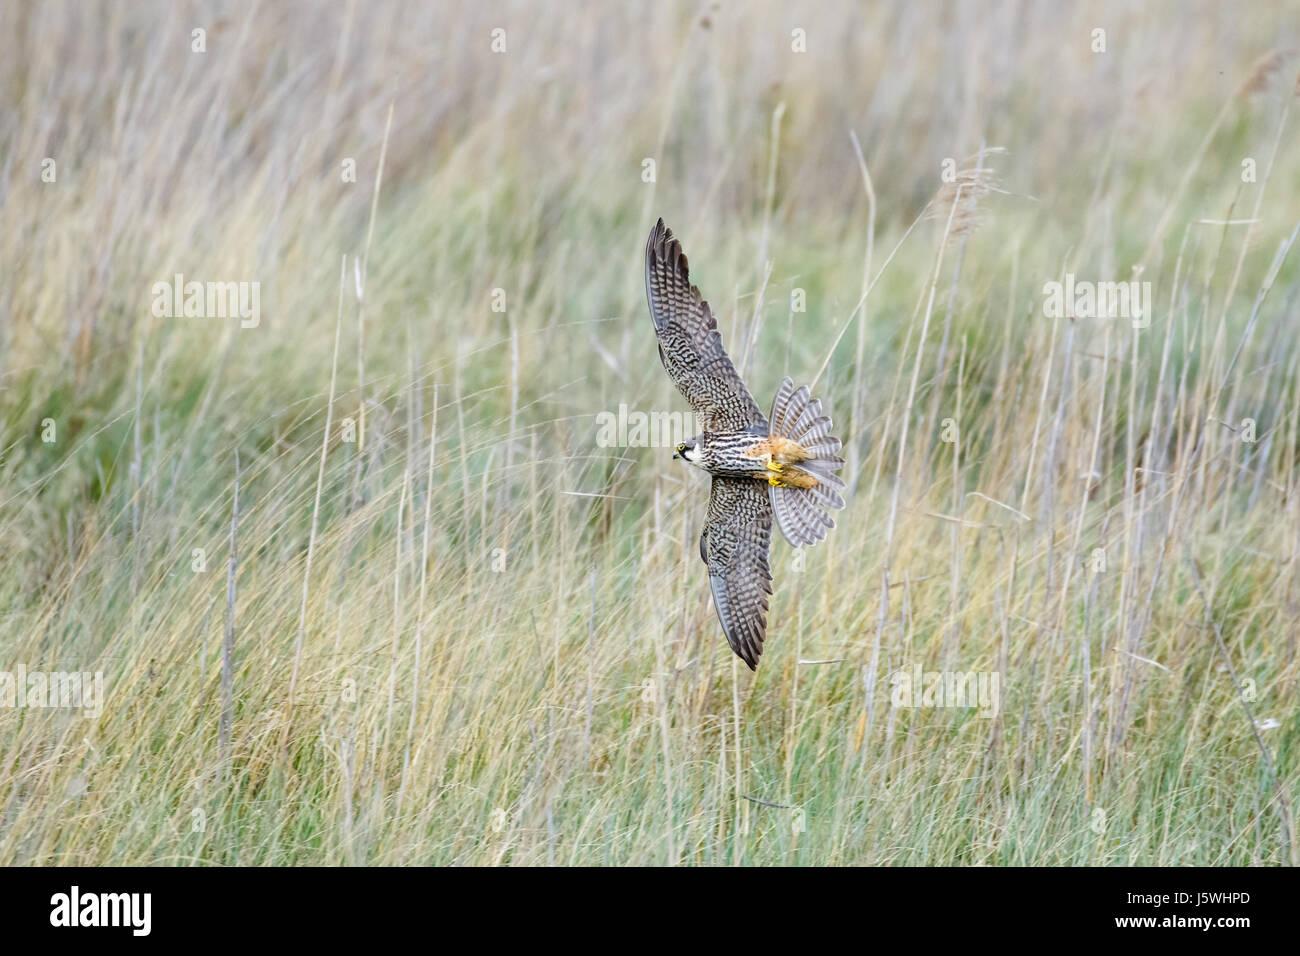 Eurasian Hobby falcon (Falco subbuteo) flying, in flight, banking hard and low through long grass - Stock Image